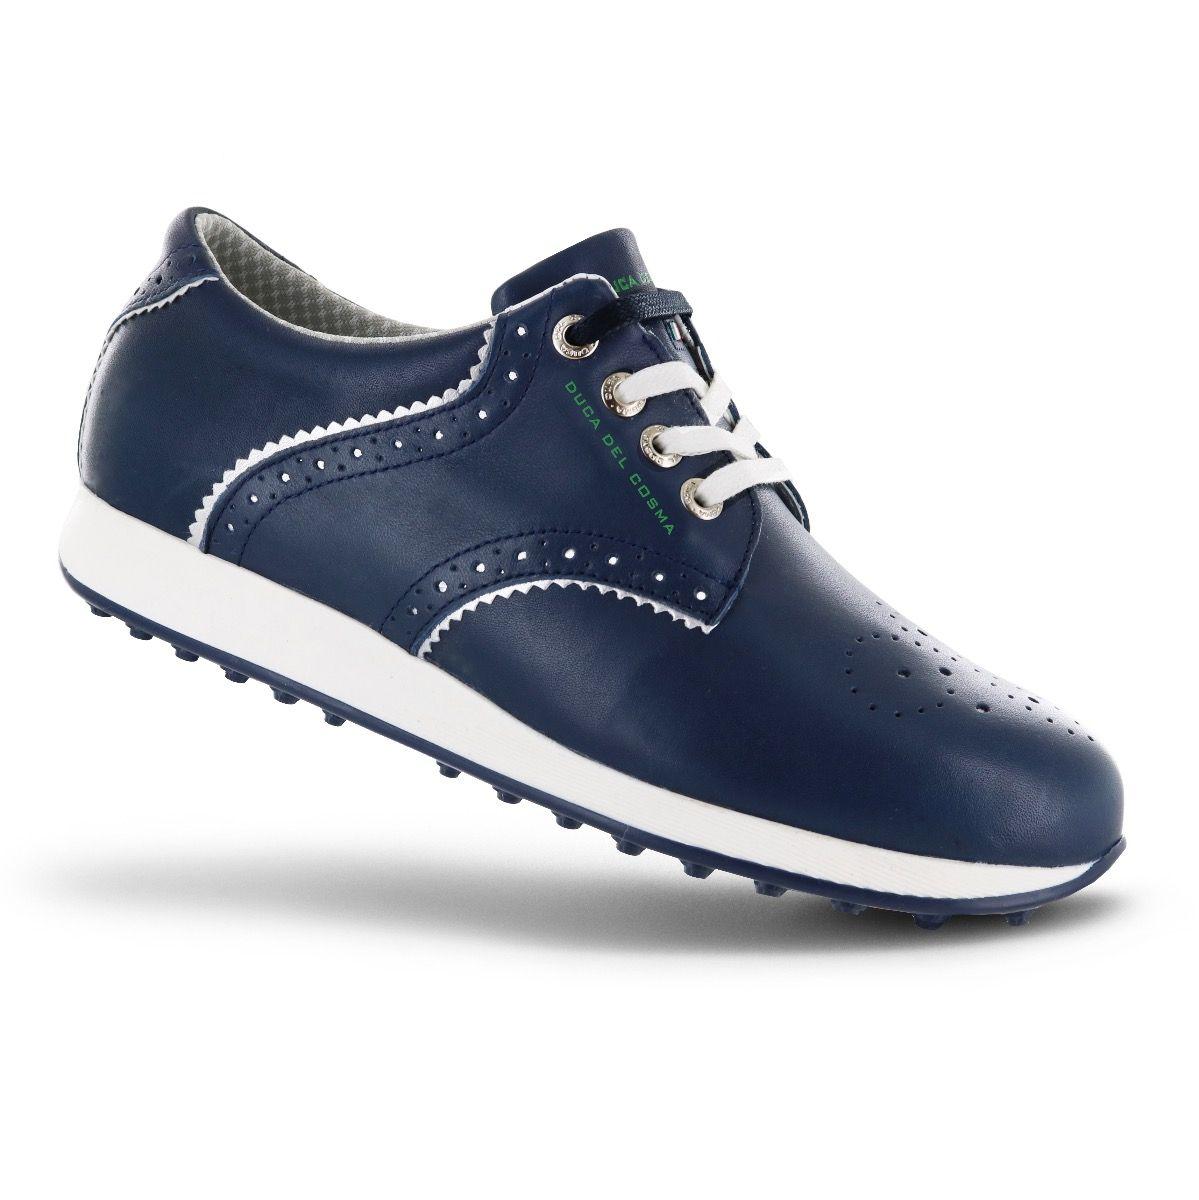 Womens golf shoes Duca del Cosma Isabel